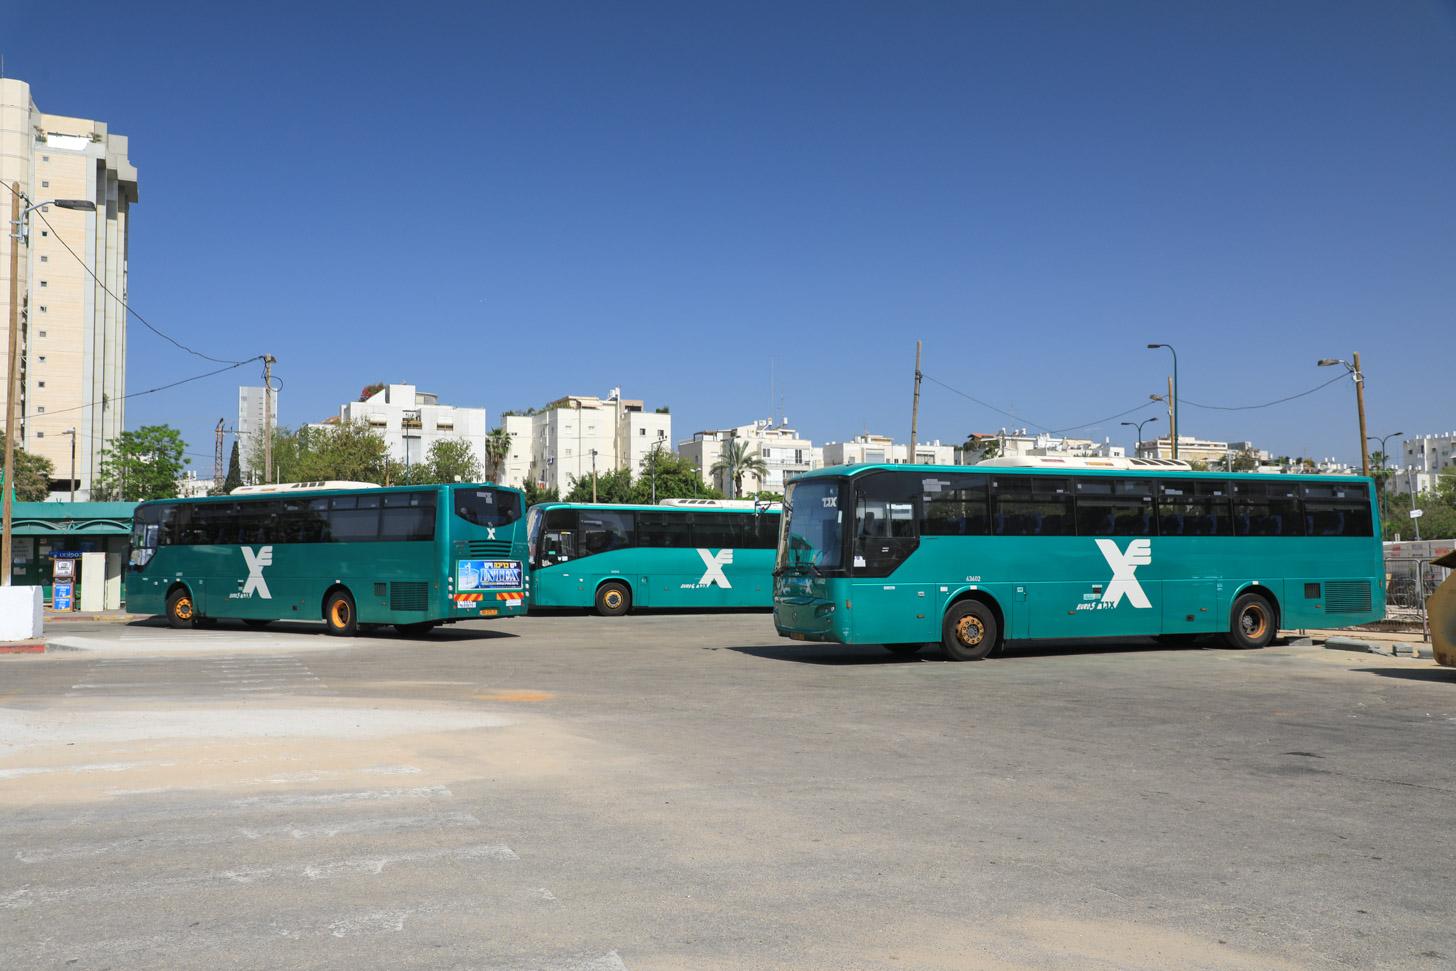 Vervoer in Israël